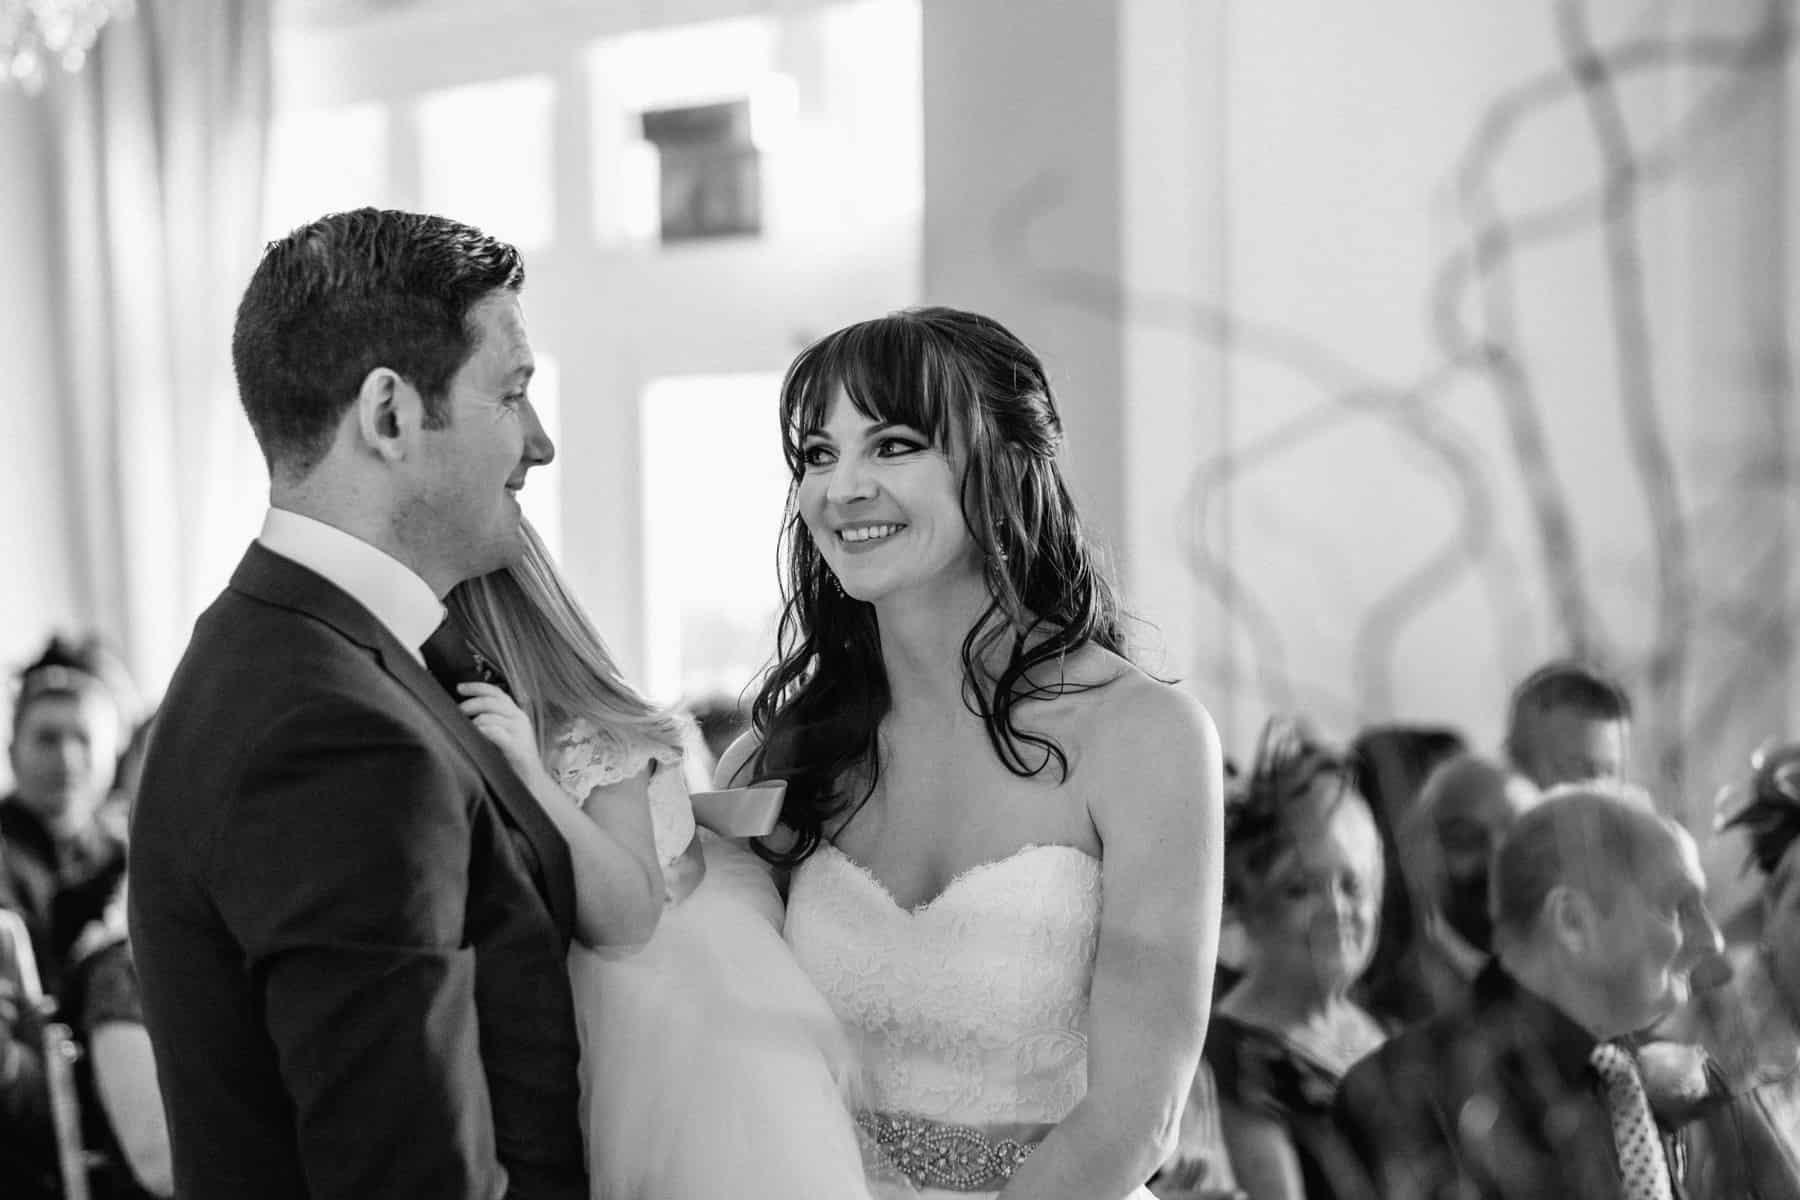 wedding photography looks of love (1 of 1)